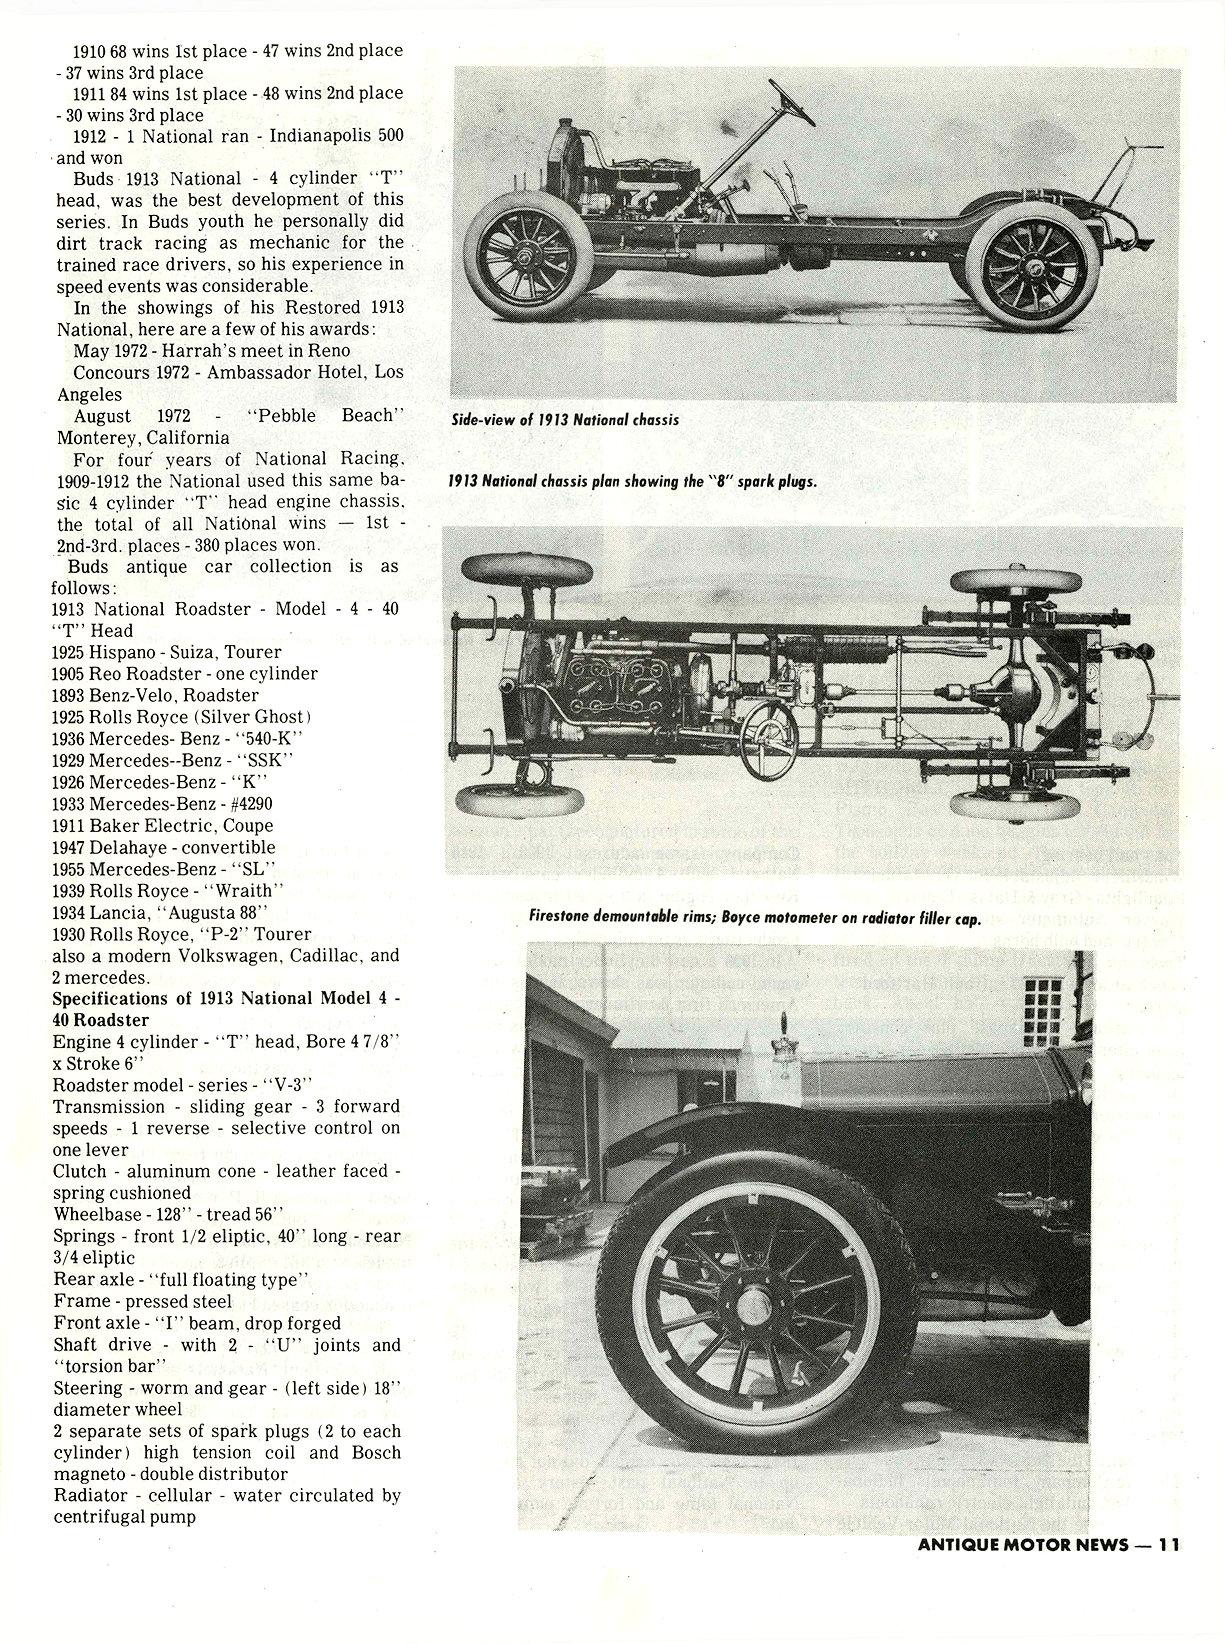 "1913 NATIONAL M. L. ""Bud"" Cohn, owner THE RESTORER Researched by Clifford Sklarek ANTIQUE MOTOR NEWS & Atlantic Auto Advertiser November 1972 8.25″x10.25 page 11"